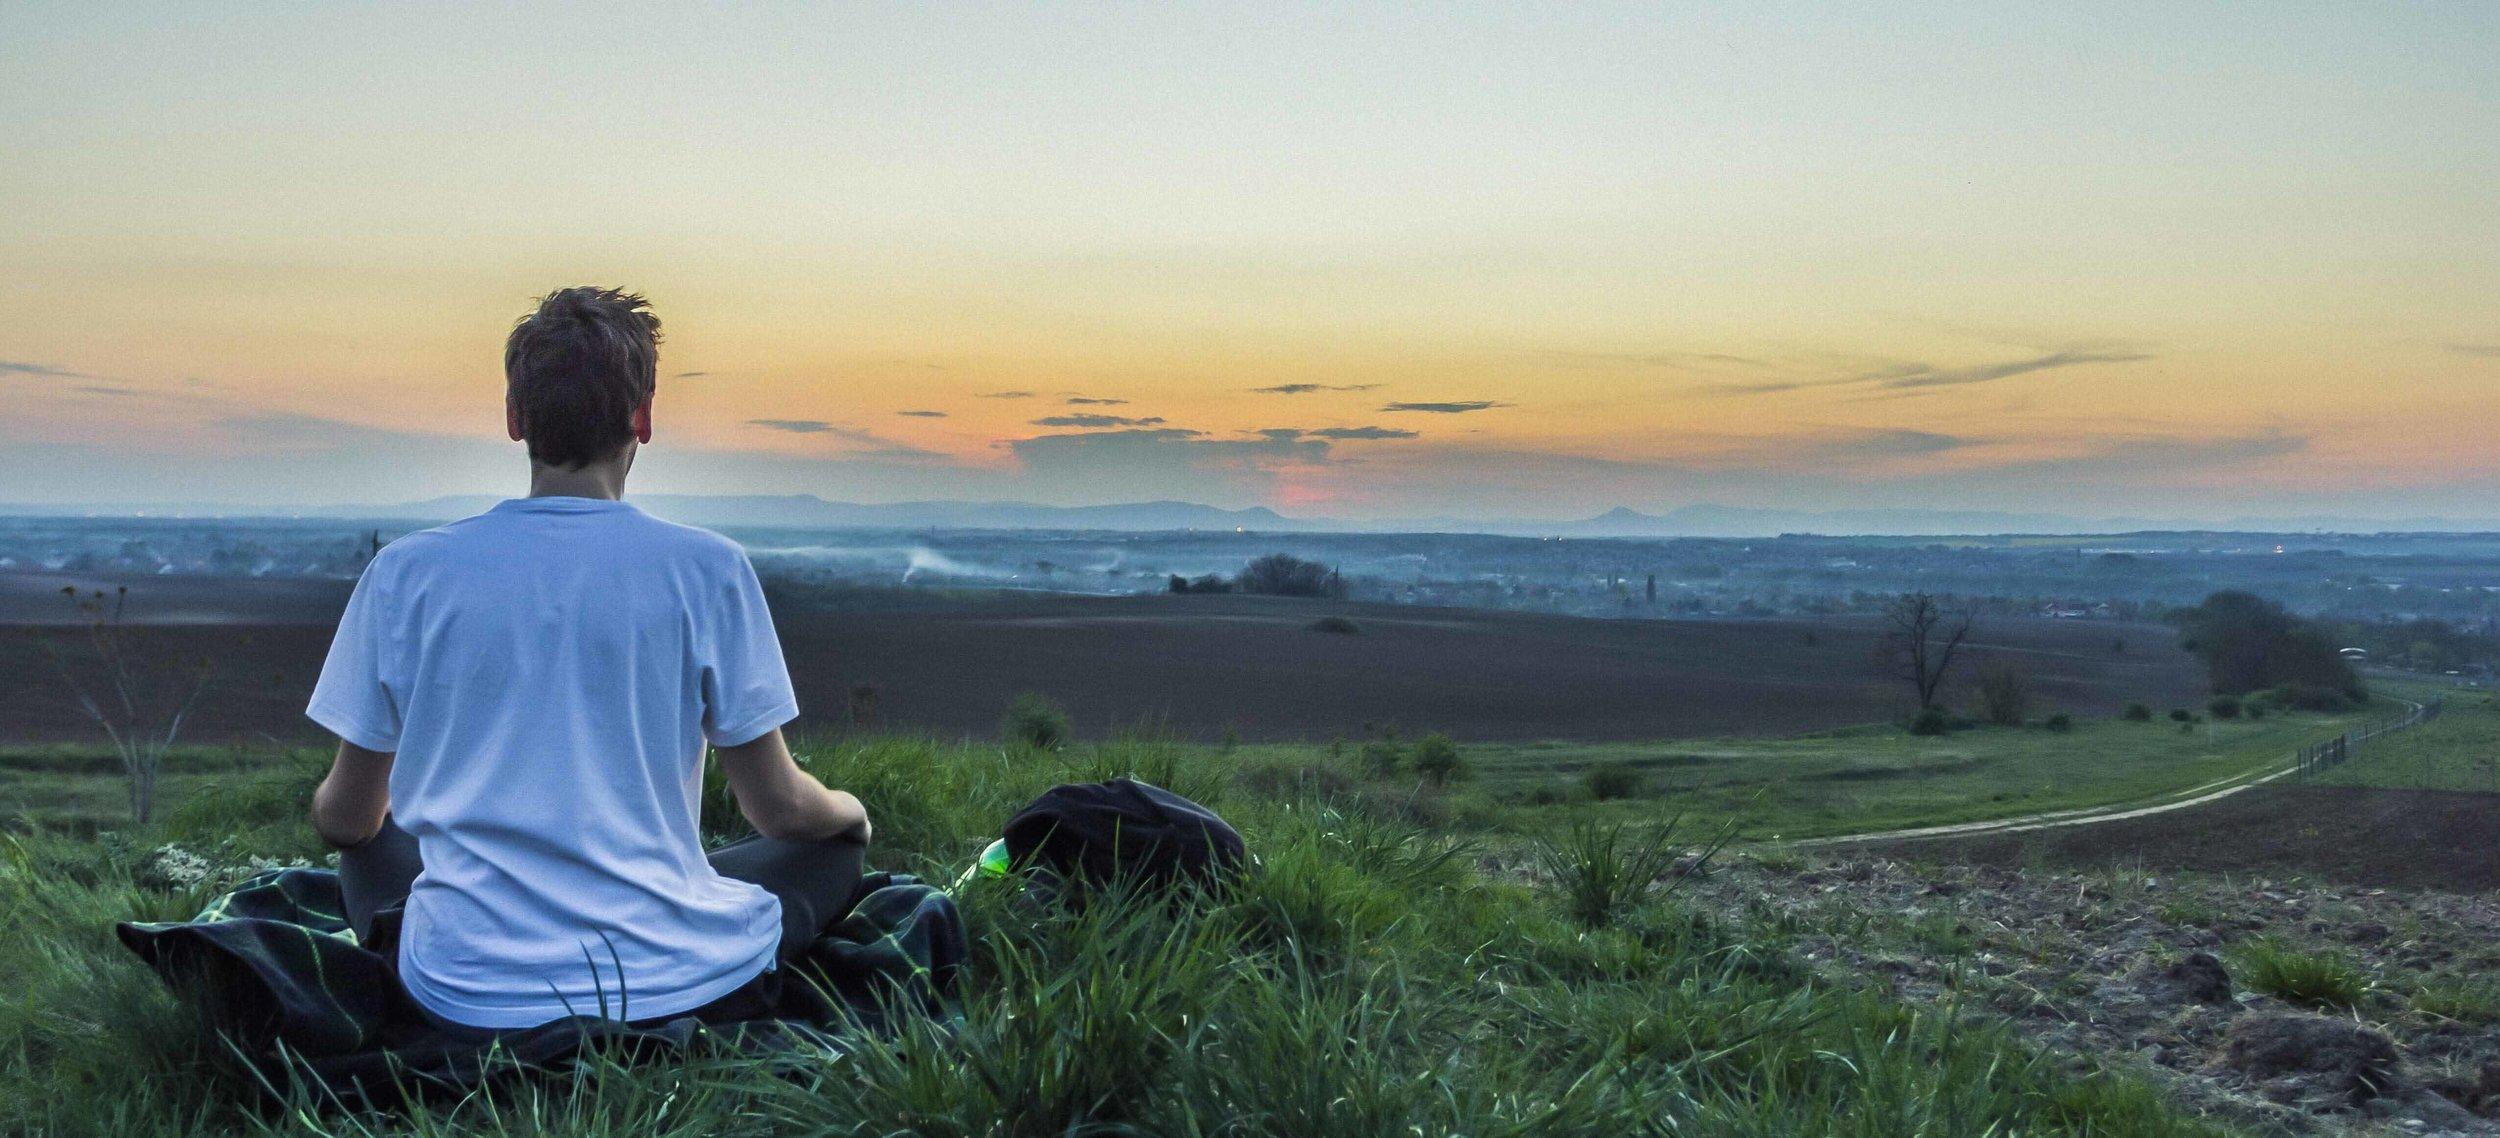 Beginners Yoga Courses, Classes in Manali